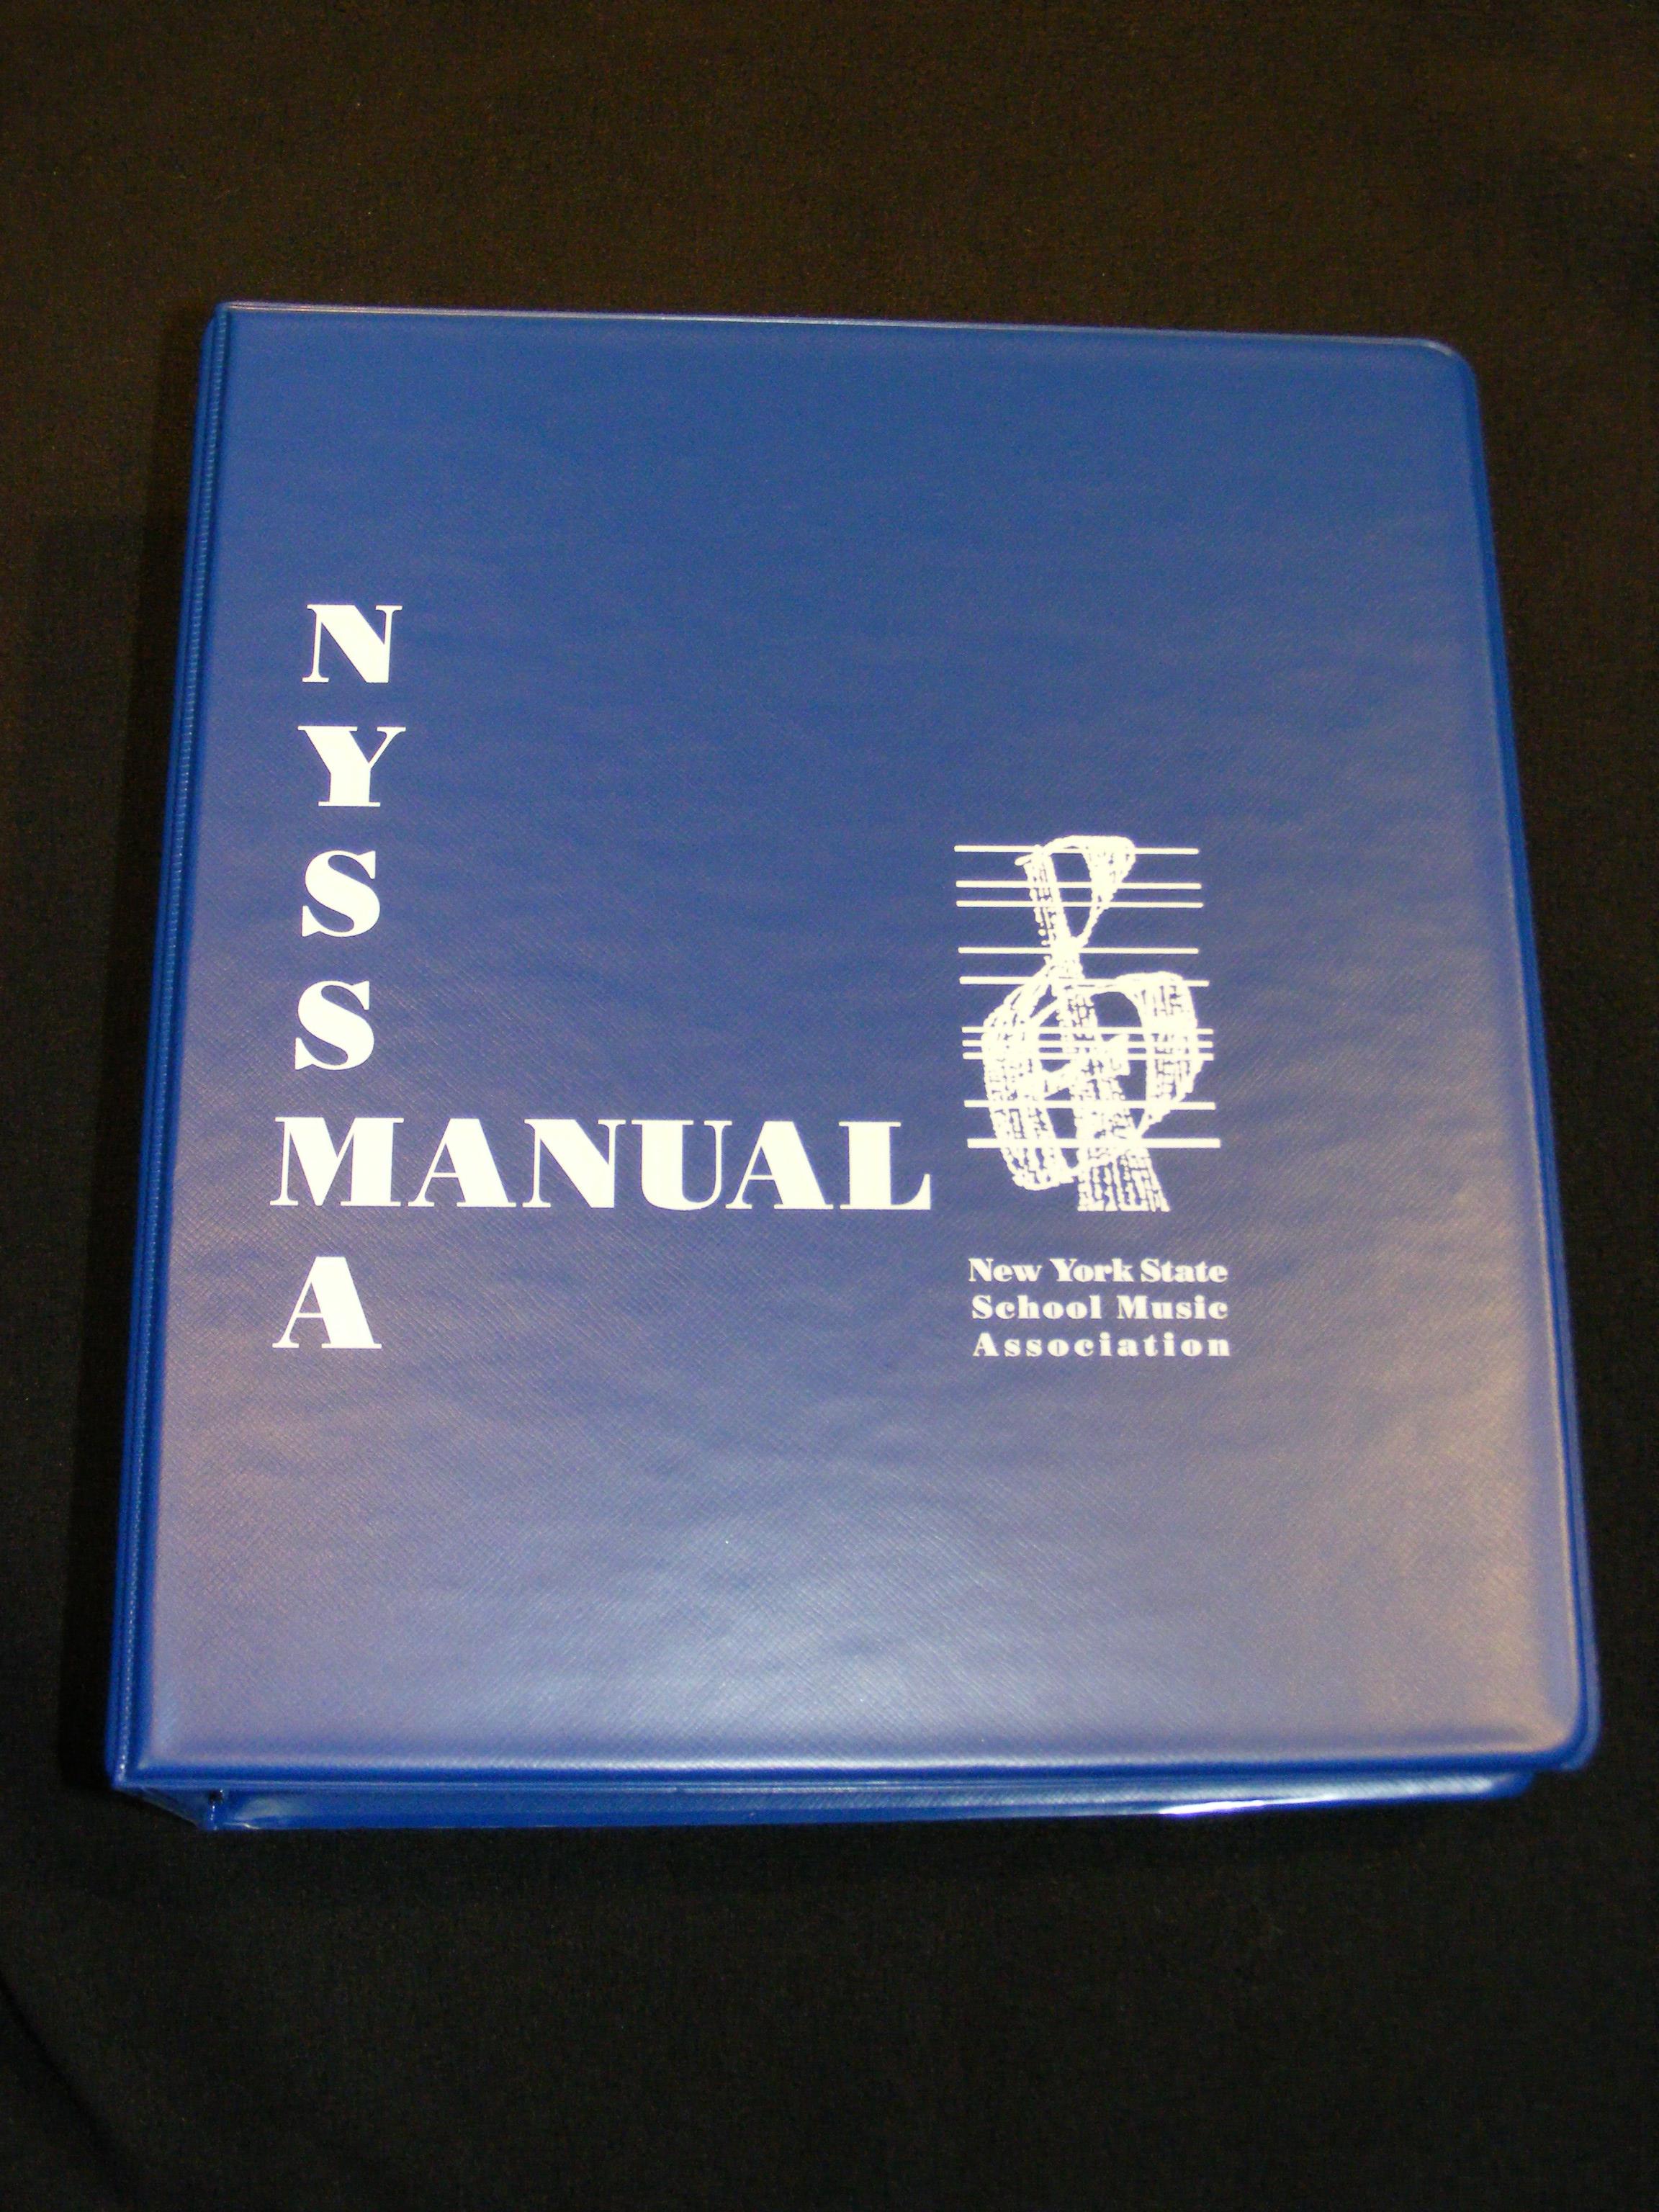 NYSSMA Manual – New York State School Music Association